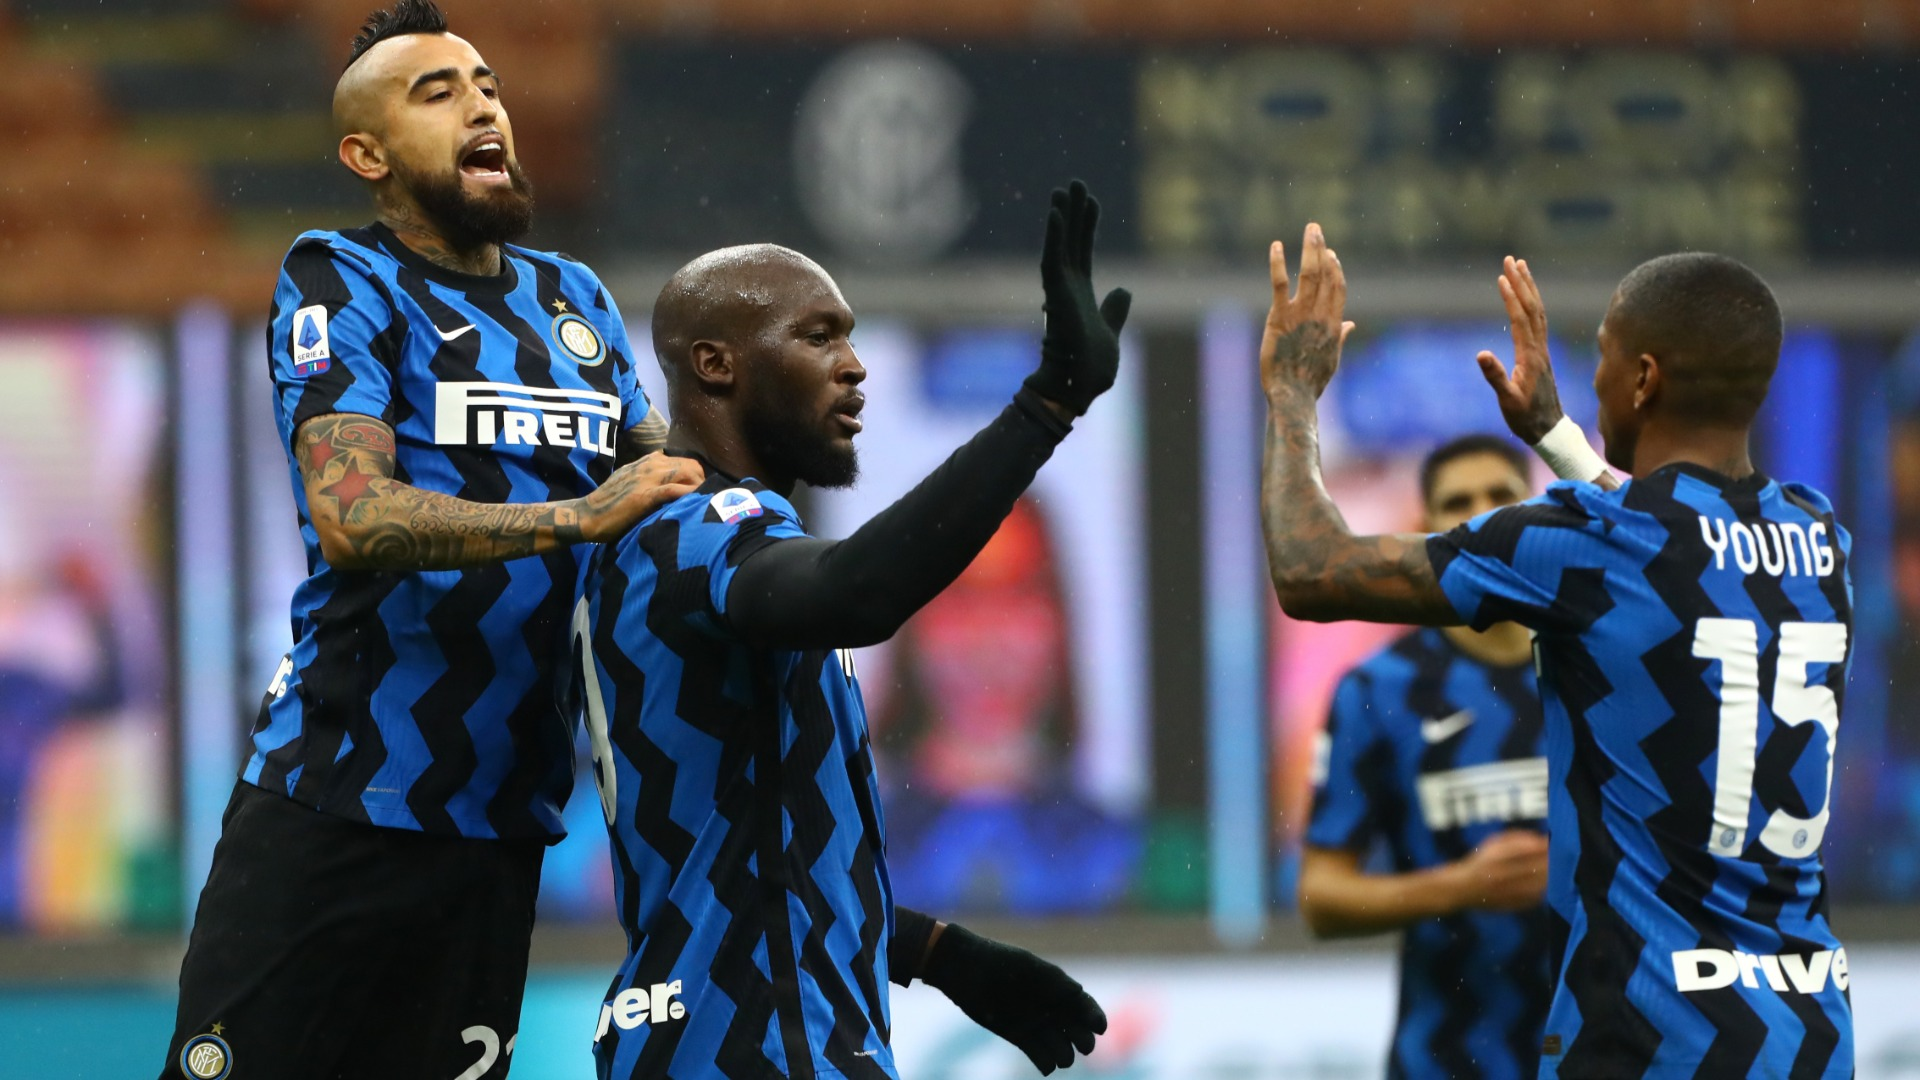 Inter 2-1 Spezia: Nerazzurri keep pressure on Milan with sixth successive win